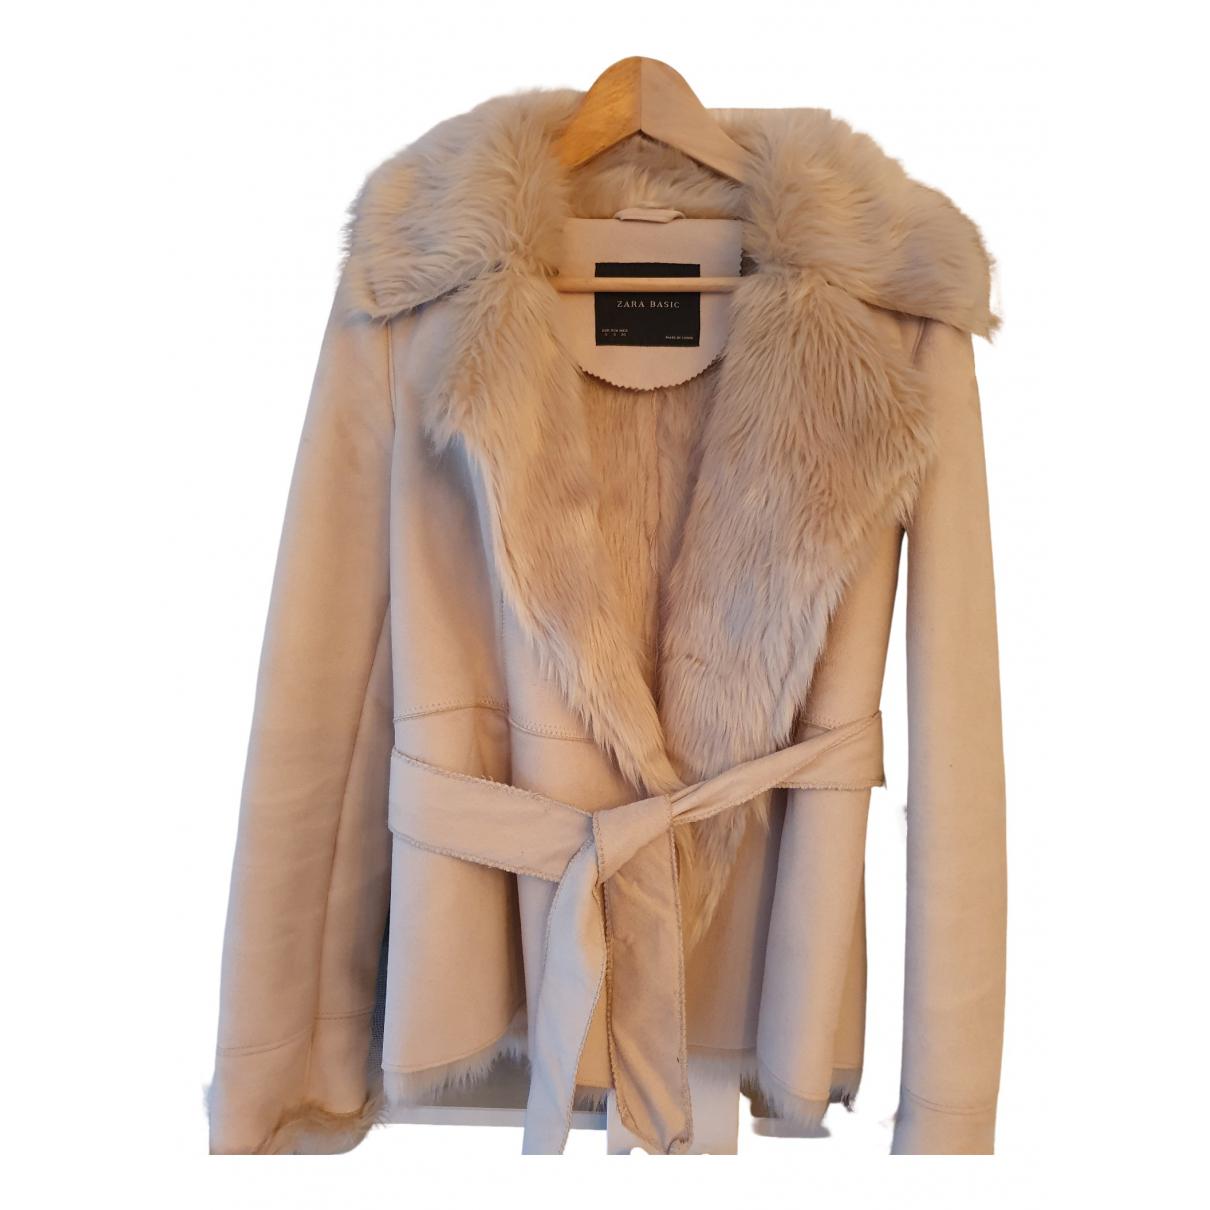 Zara \N Beige coat for Women S International